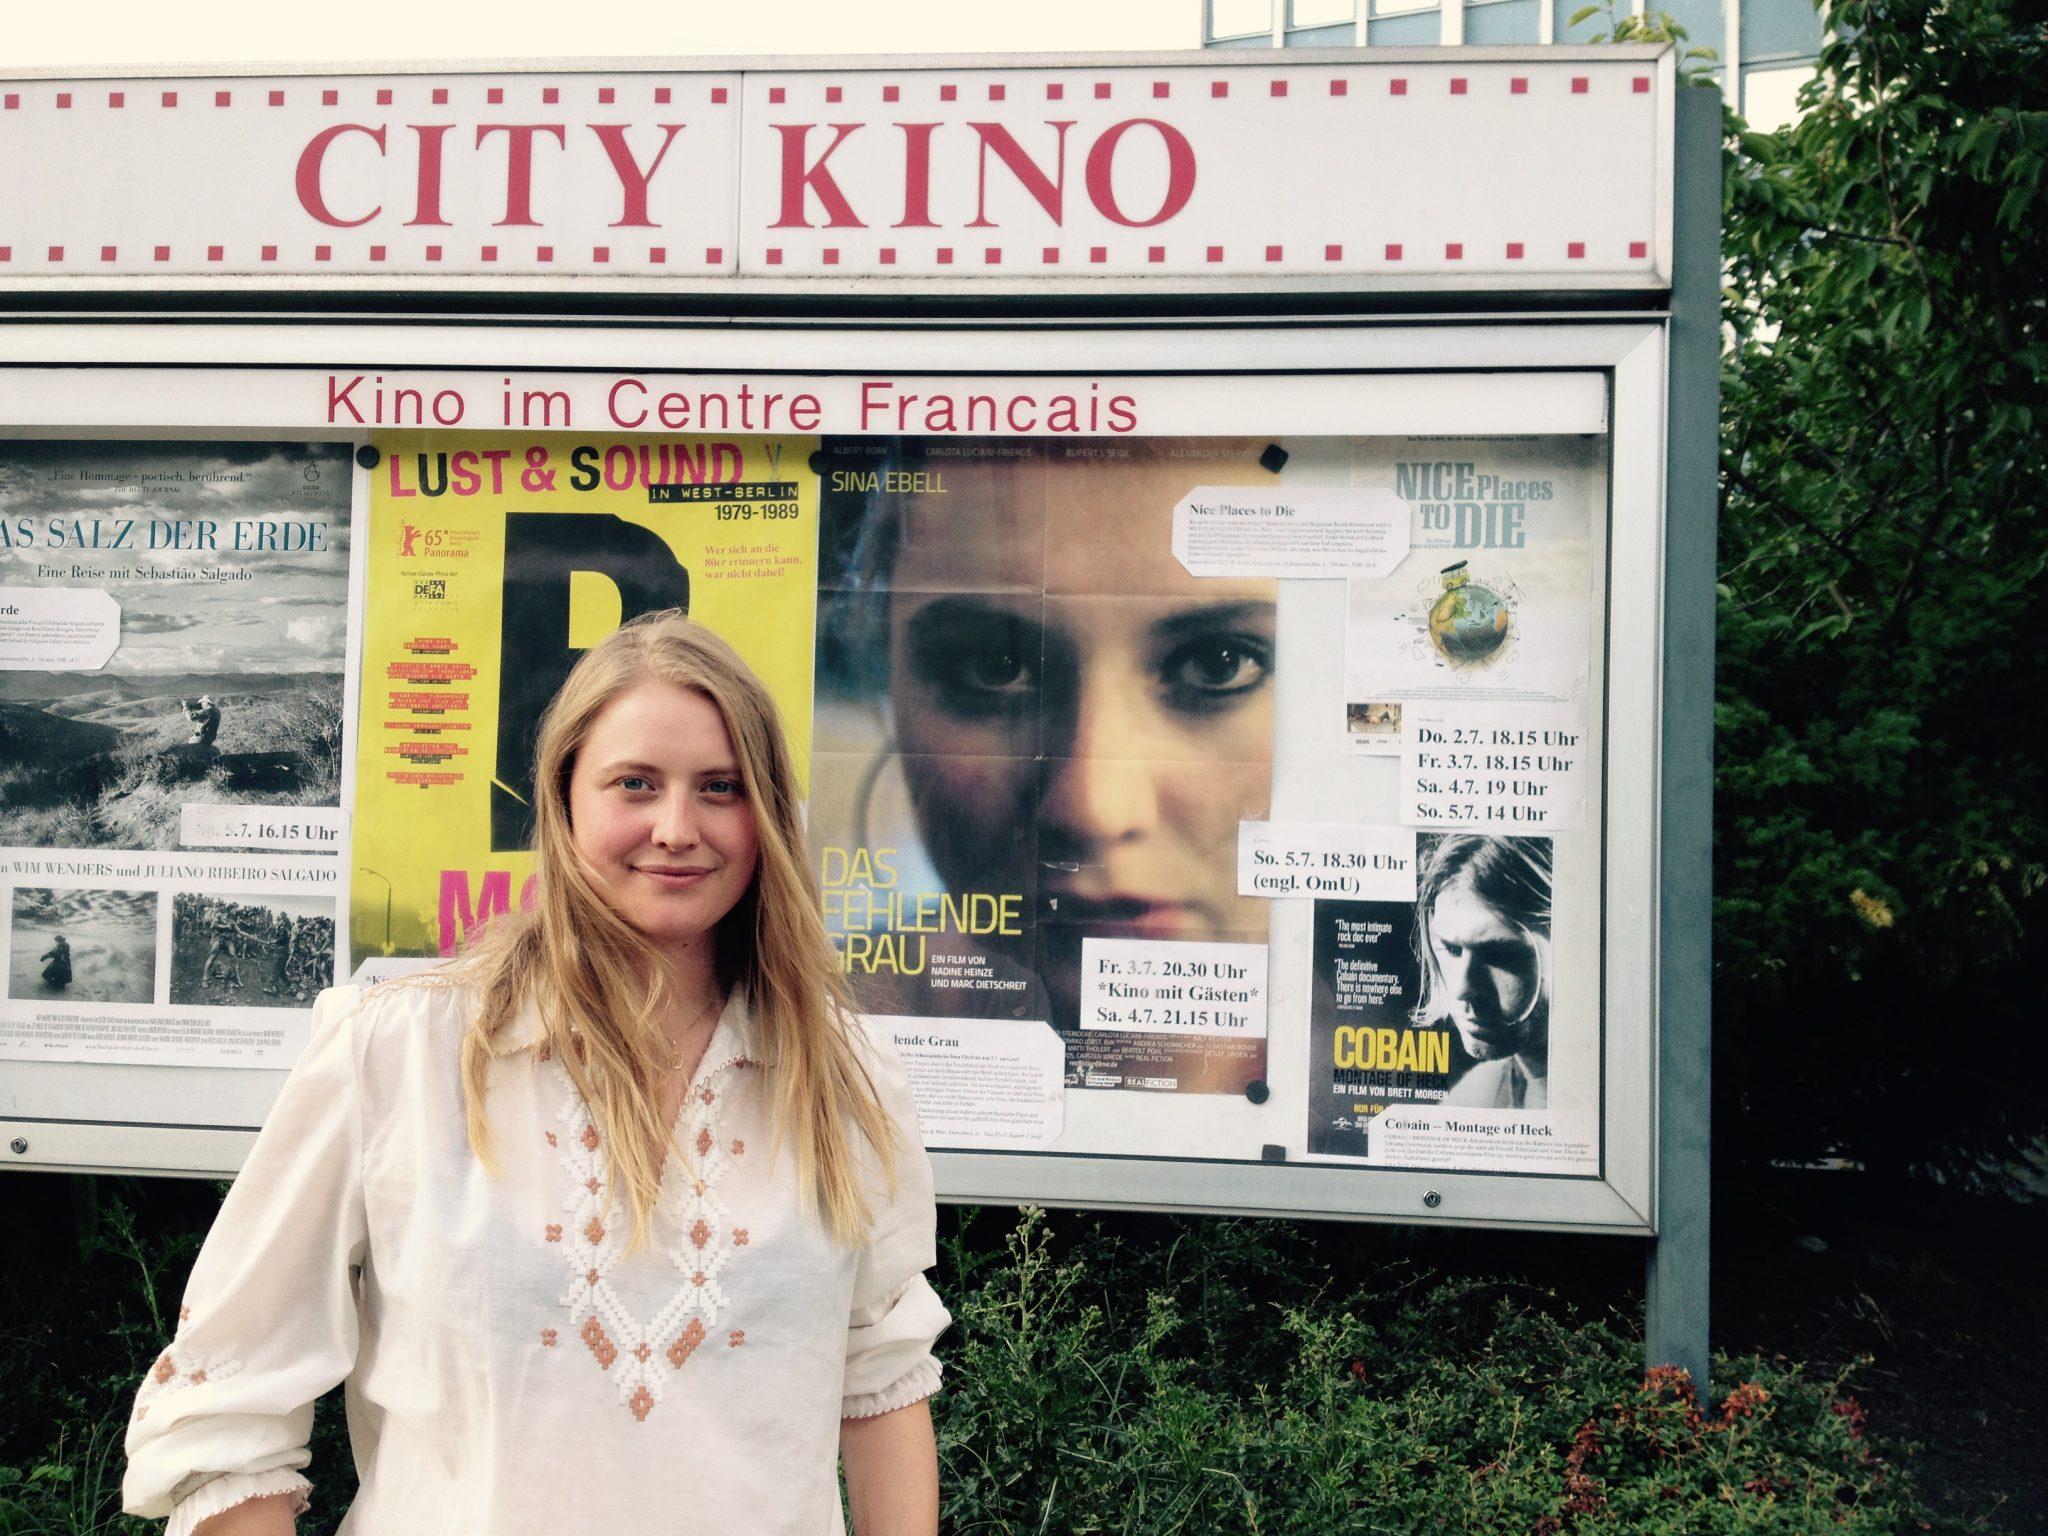 Das fehlende Grau im City Kino